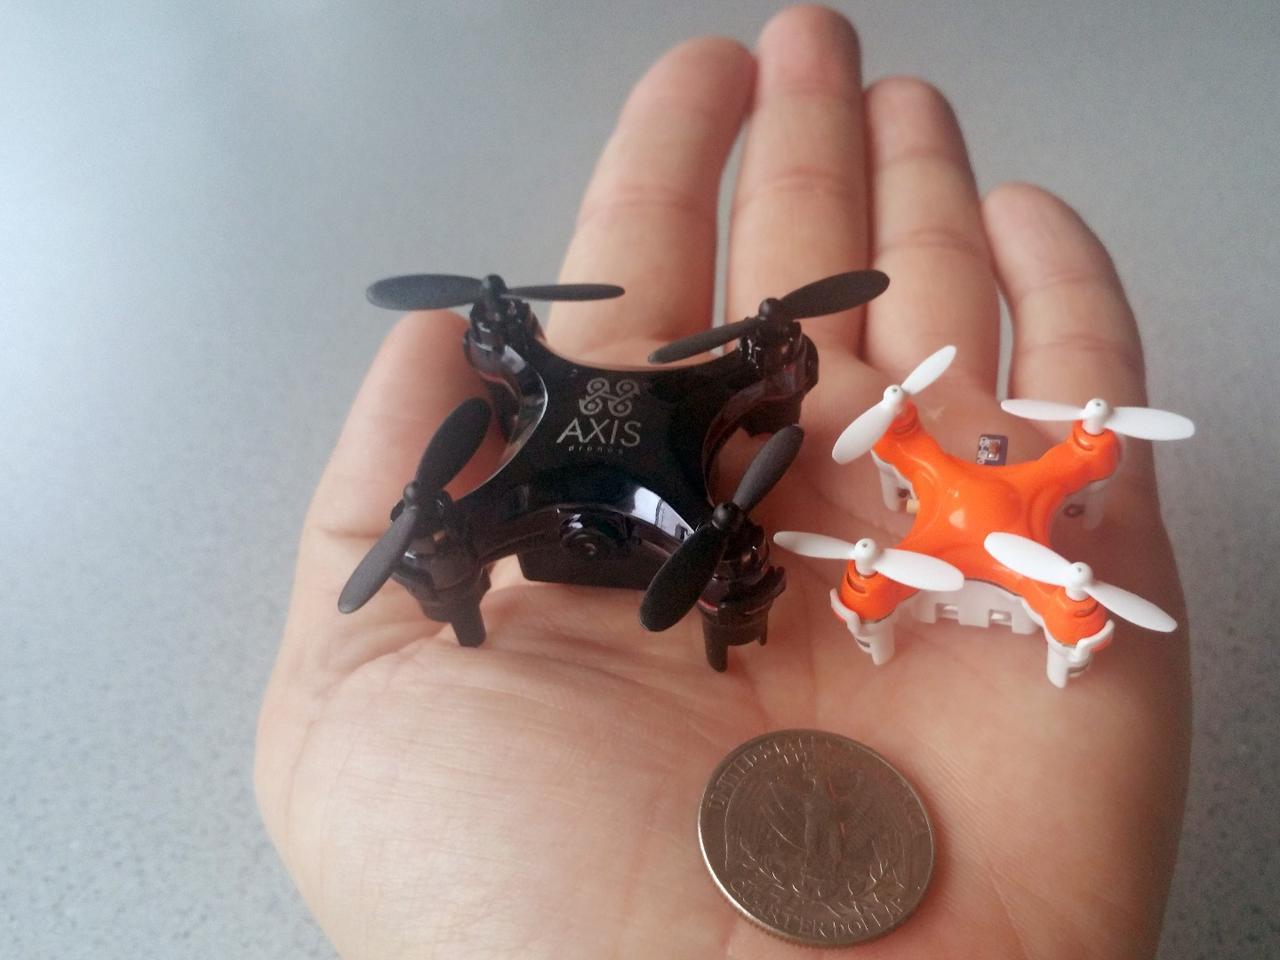 The Axis Drones Vidius (left) next to the smaller Aerius (right)